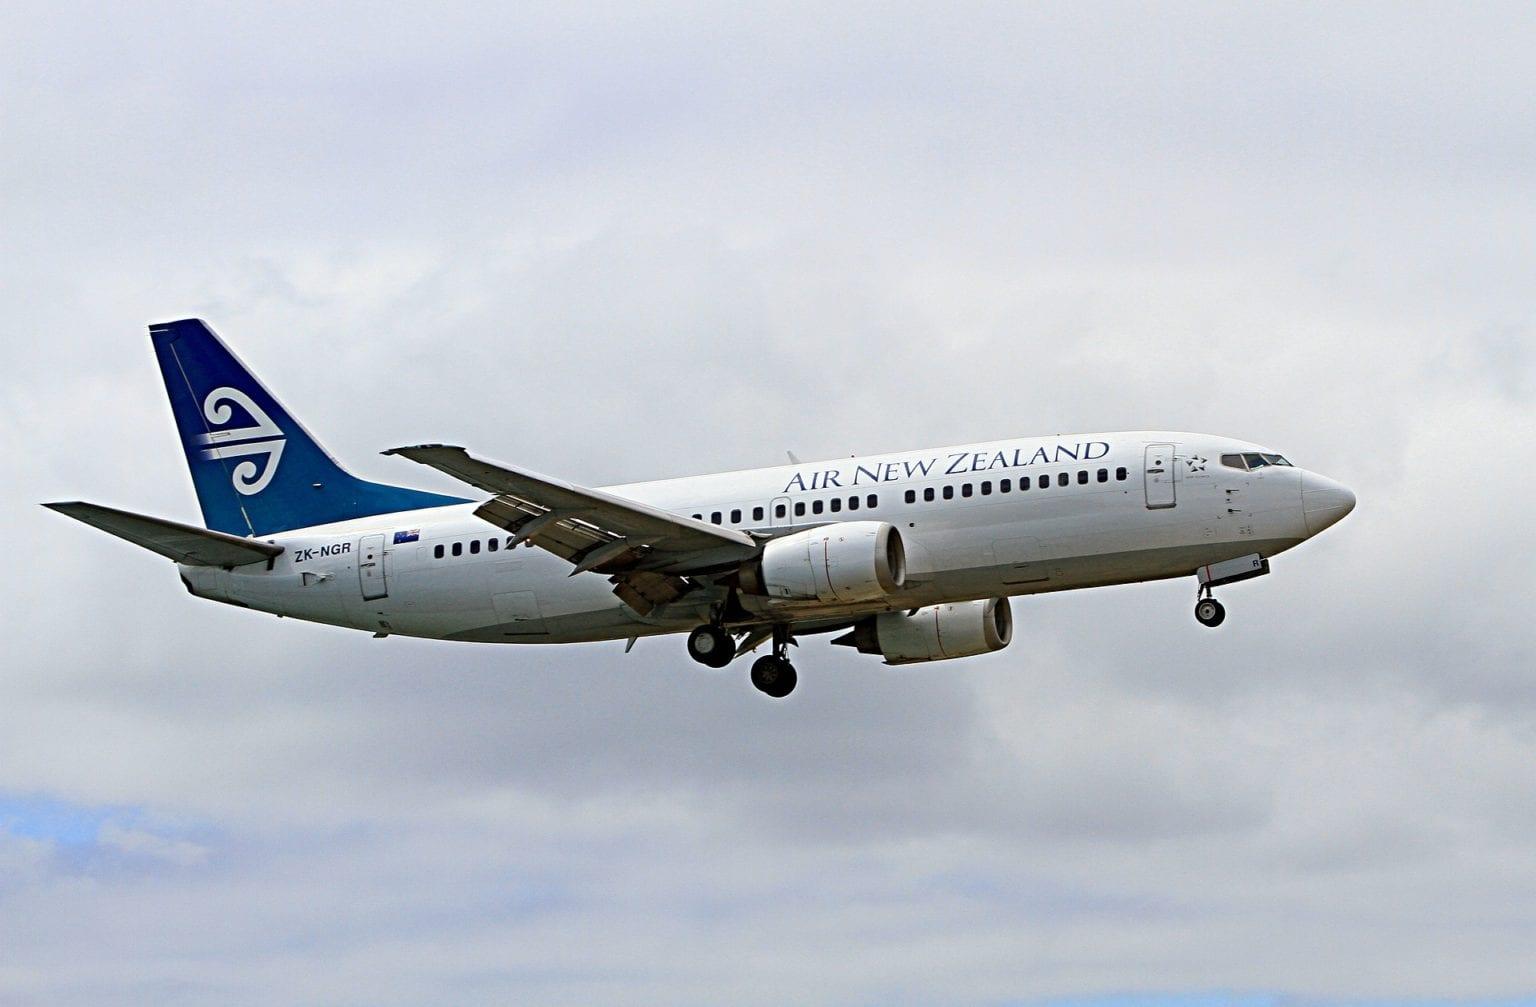 Letadlo Air New Zealand